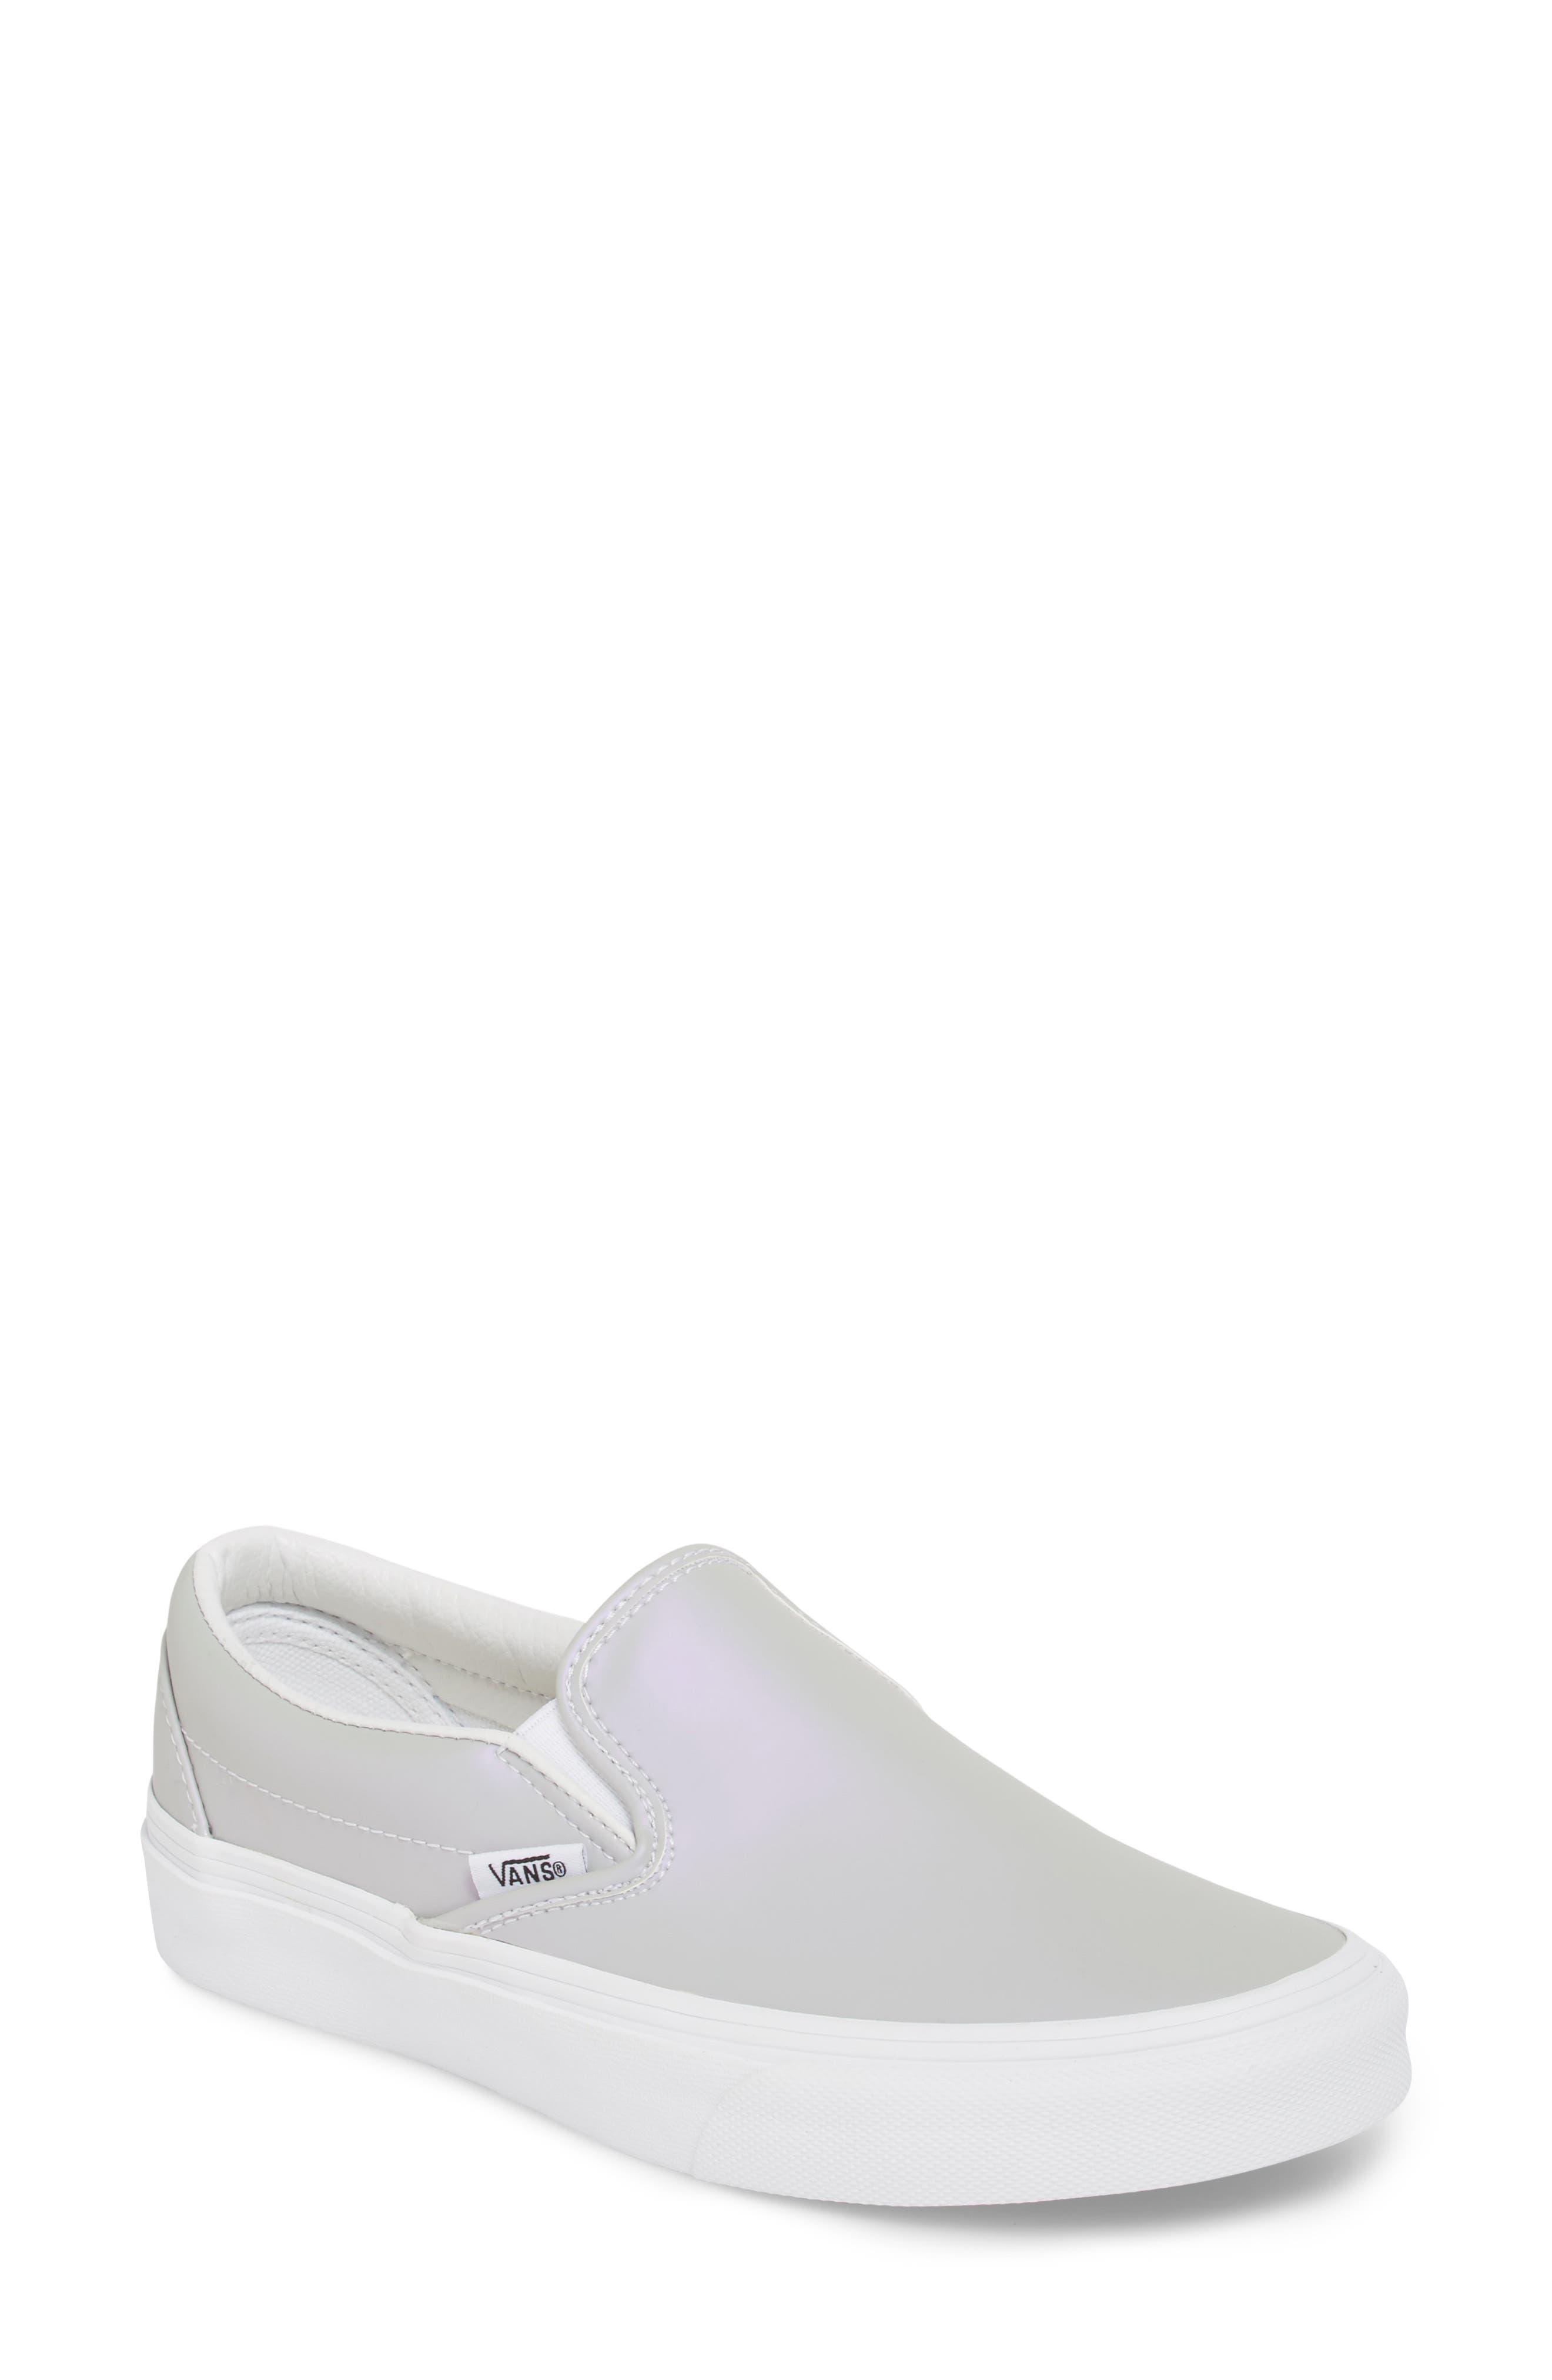 ,                             Classic Slip-On Sneaker,                             Main thumbnail 87, color,                             030